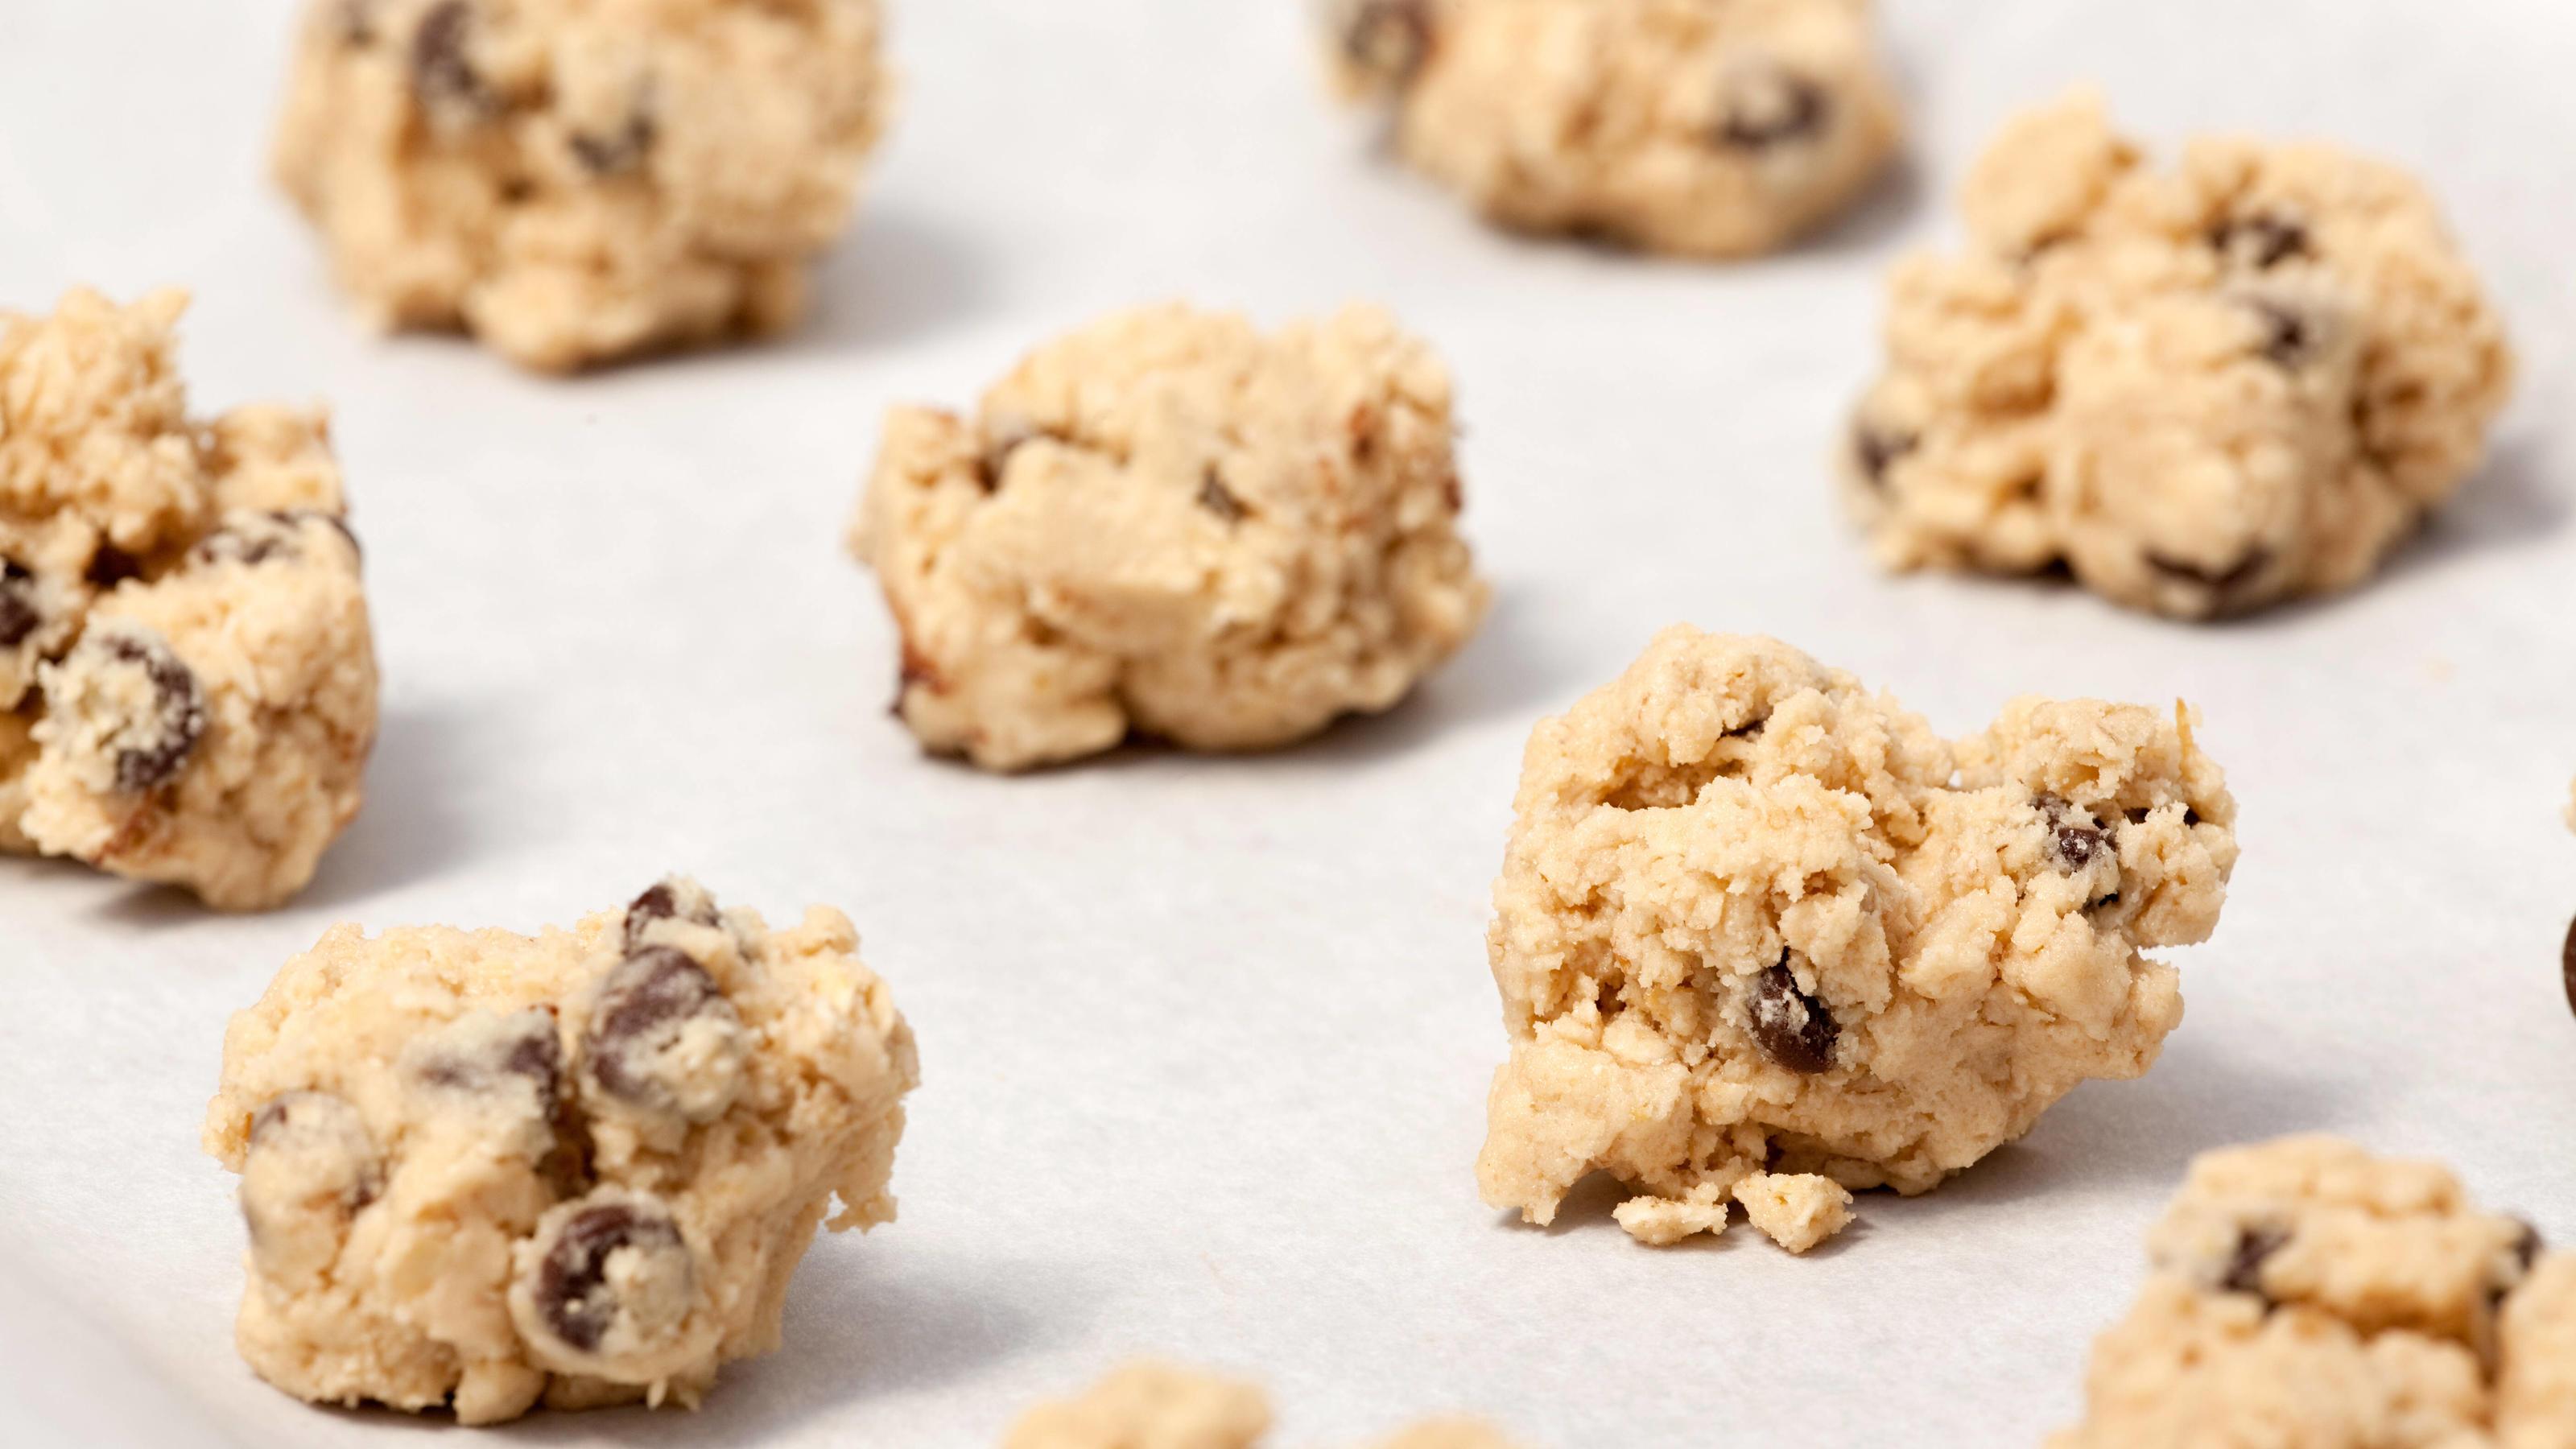 Raw Cookie Dough Raw cookie dough on a baking sheet with parchment PUBLICATIONxINxGERxSUIxAUTxONLY Copyright: xleafx 1302439